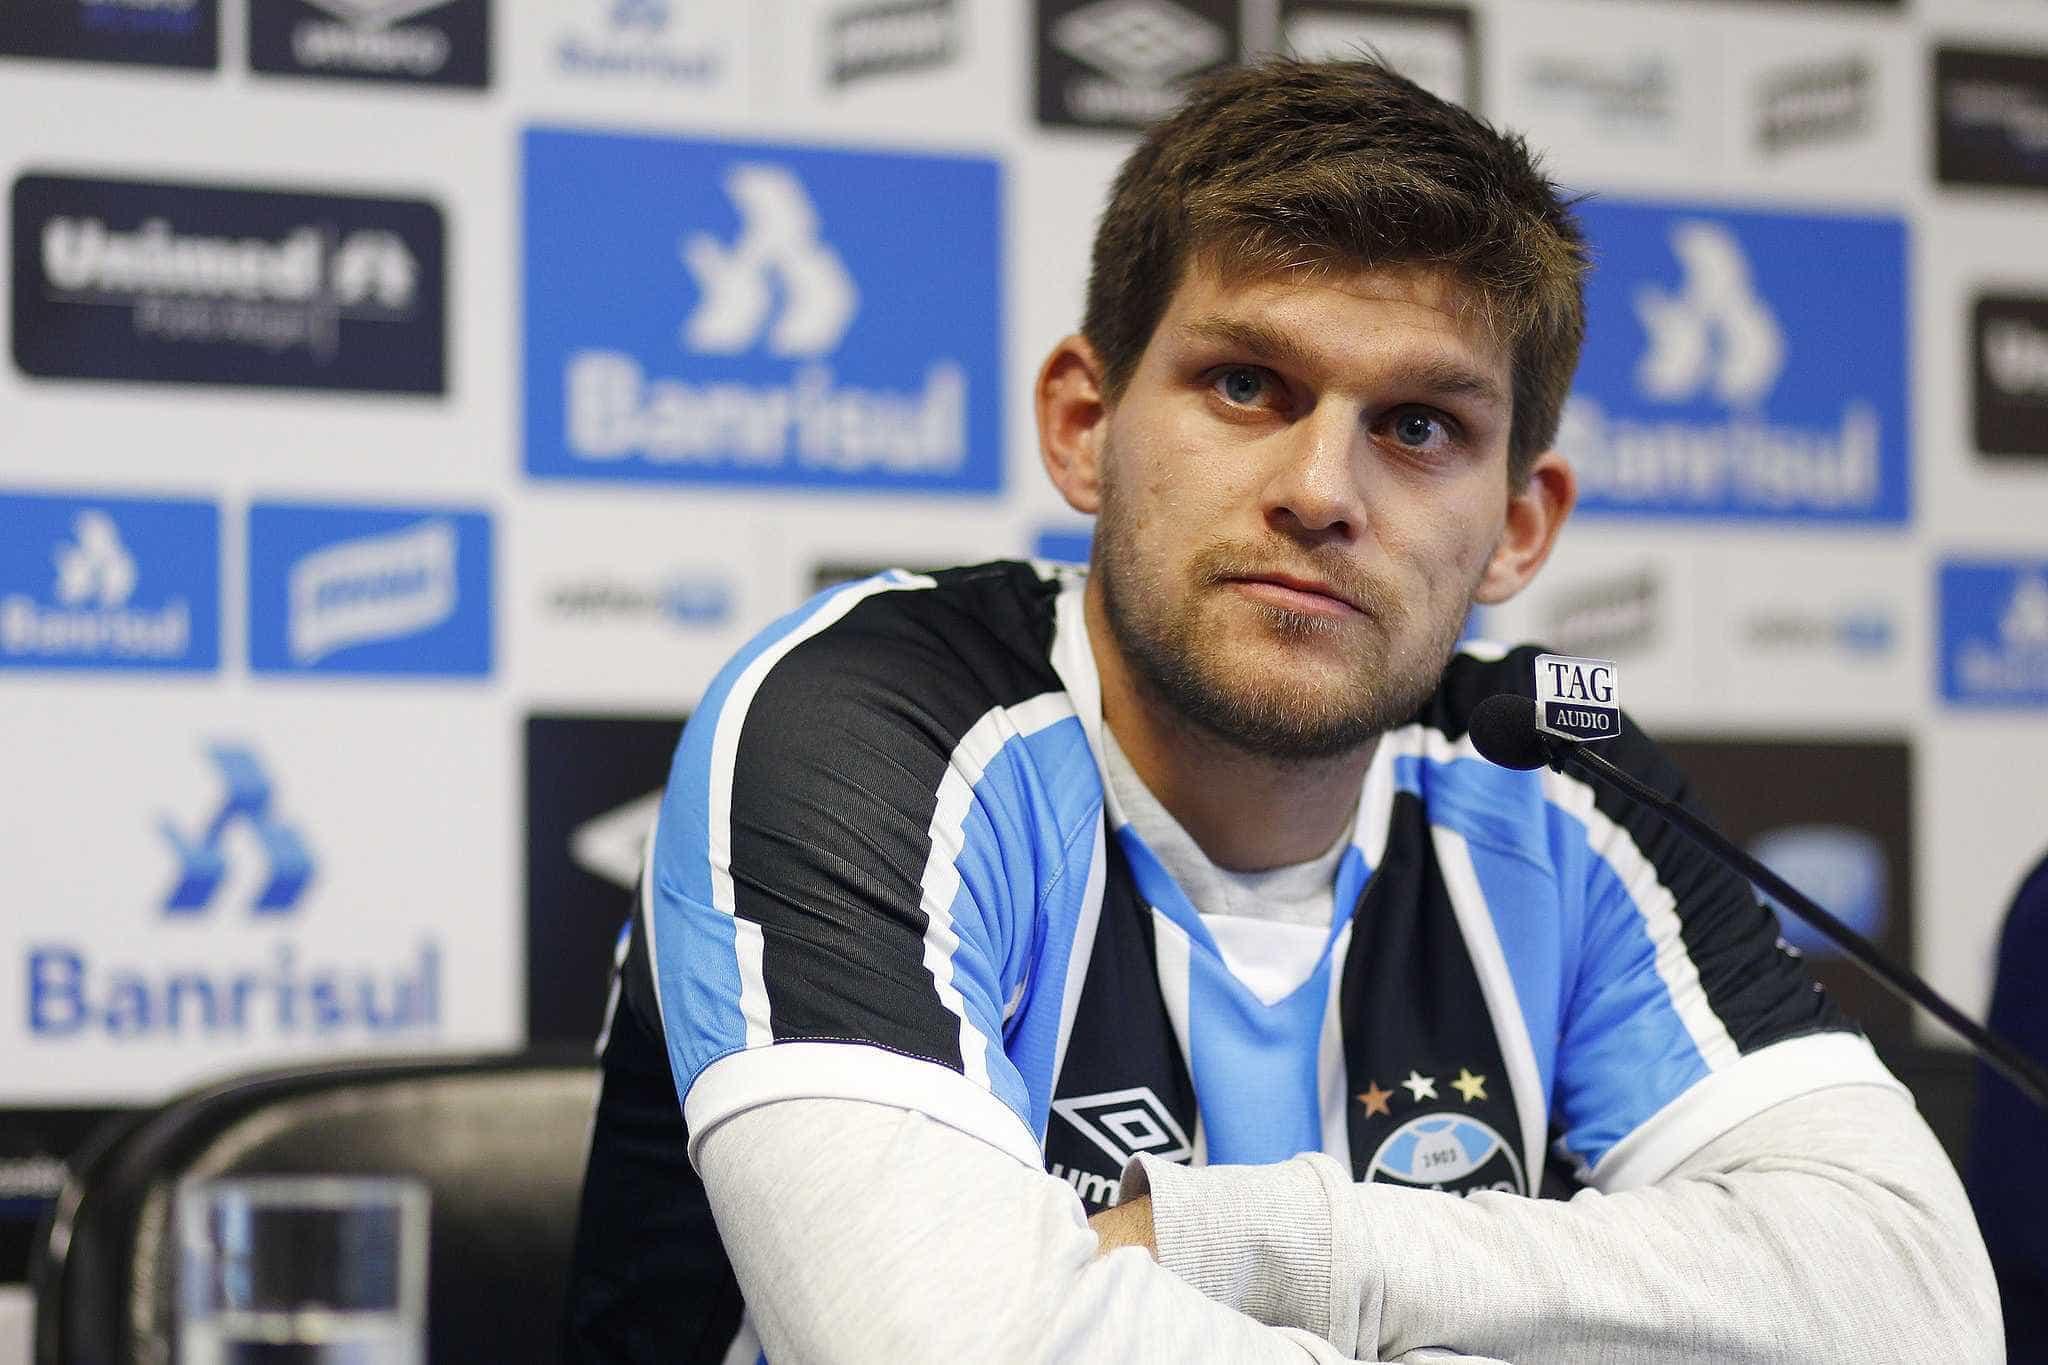 Arsenal demonstra interesse em Kannemann, do Grêmio, diz jornal